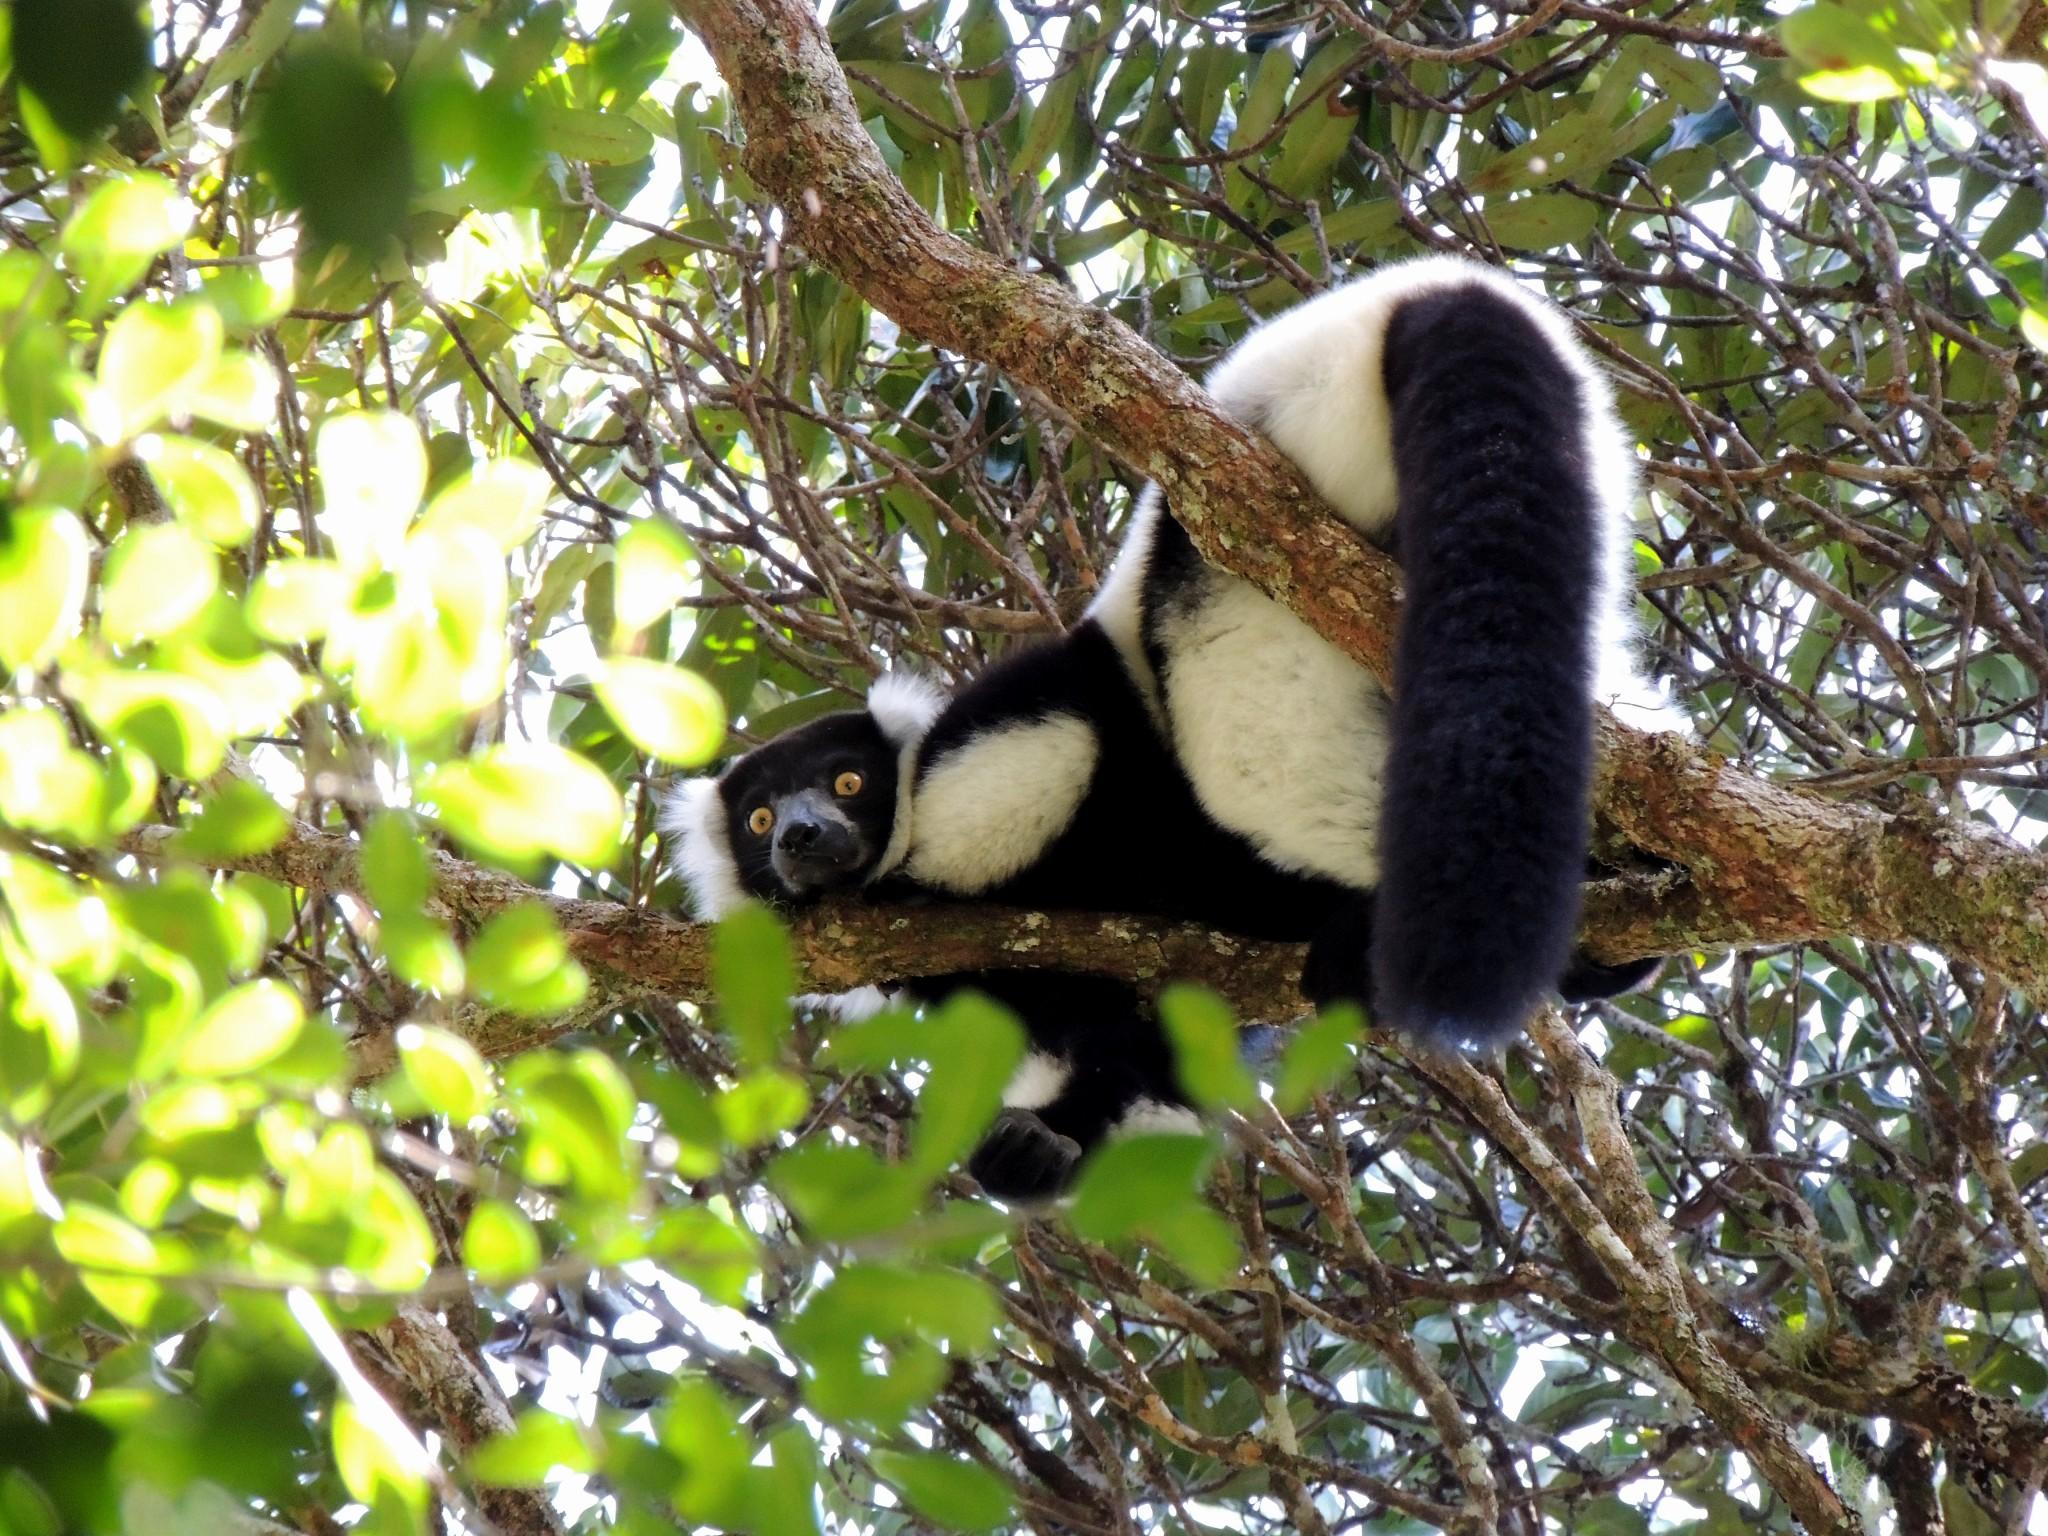 Madagascar, Zwart-witte vari of bonte maki